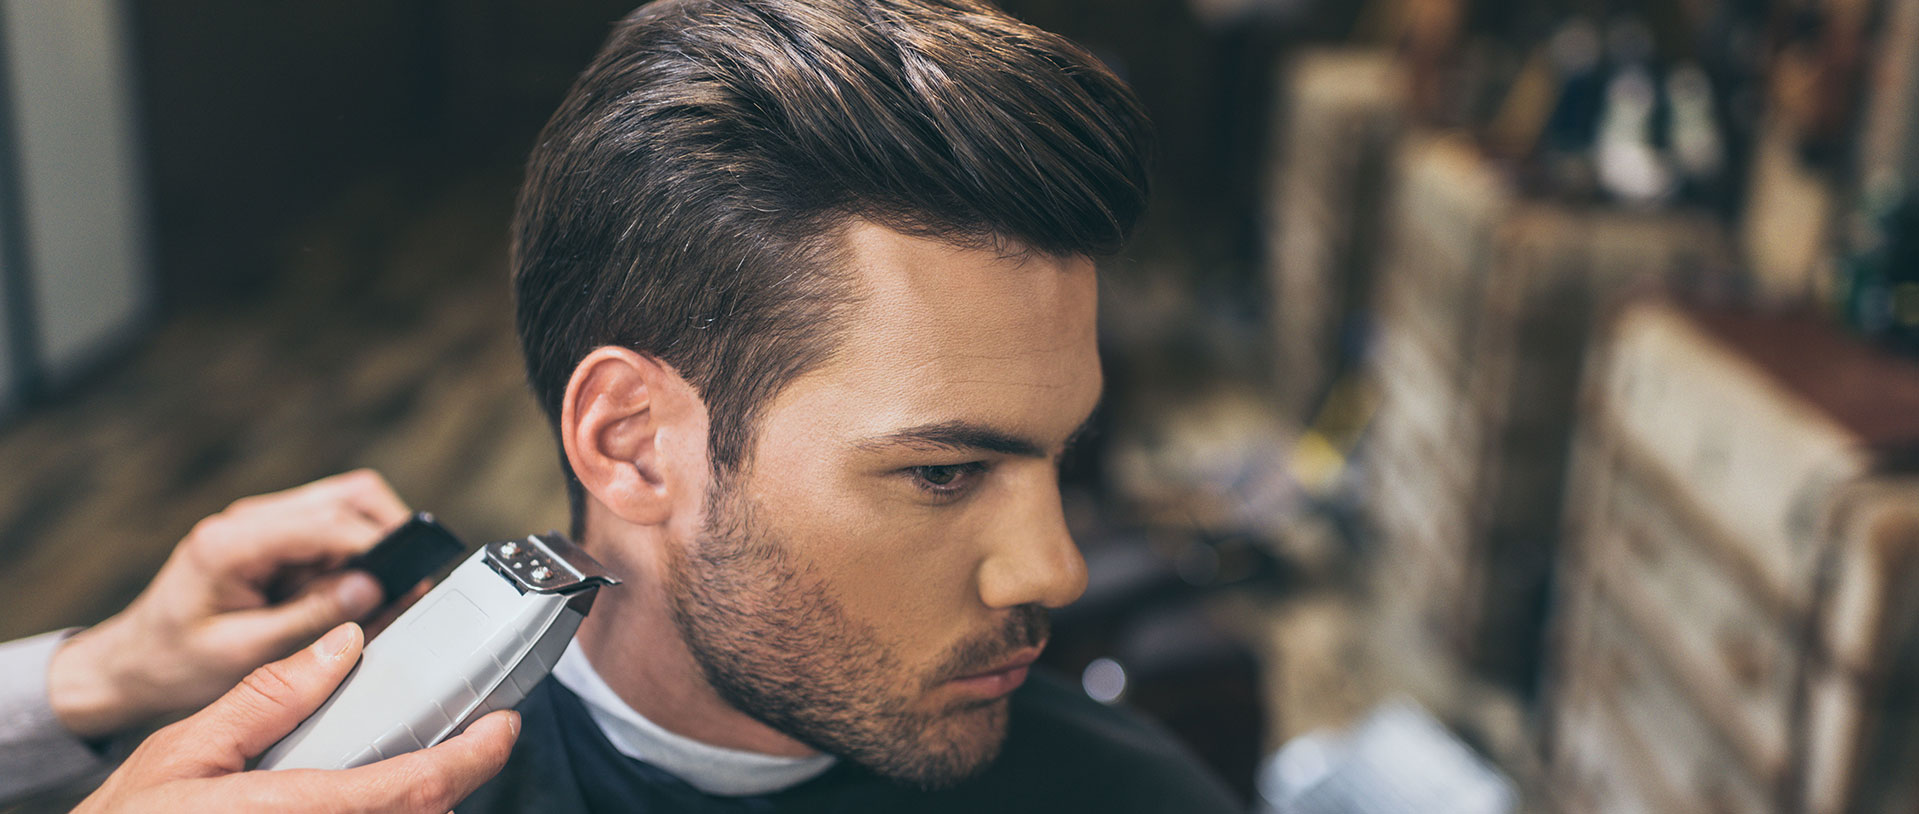 Lone Star Barber Parlor - San Angelo, Tx. mens-haircut ...